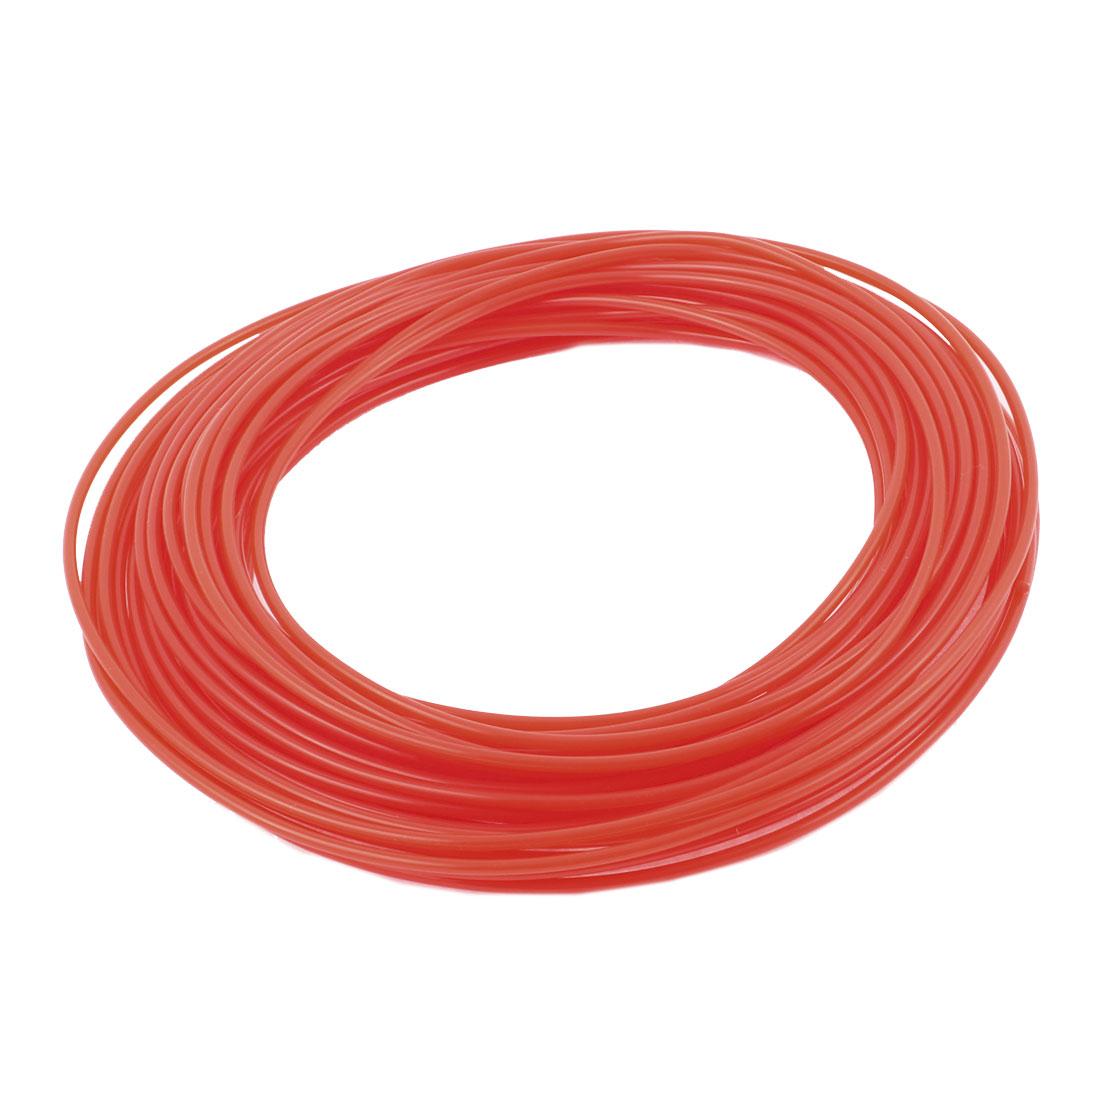 10m 3D Printer Pen Painting Filament Refills PLA Printing Material Fluo Red